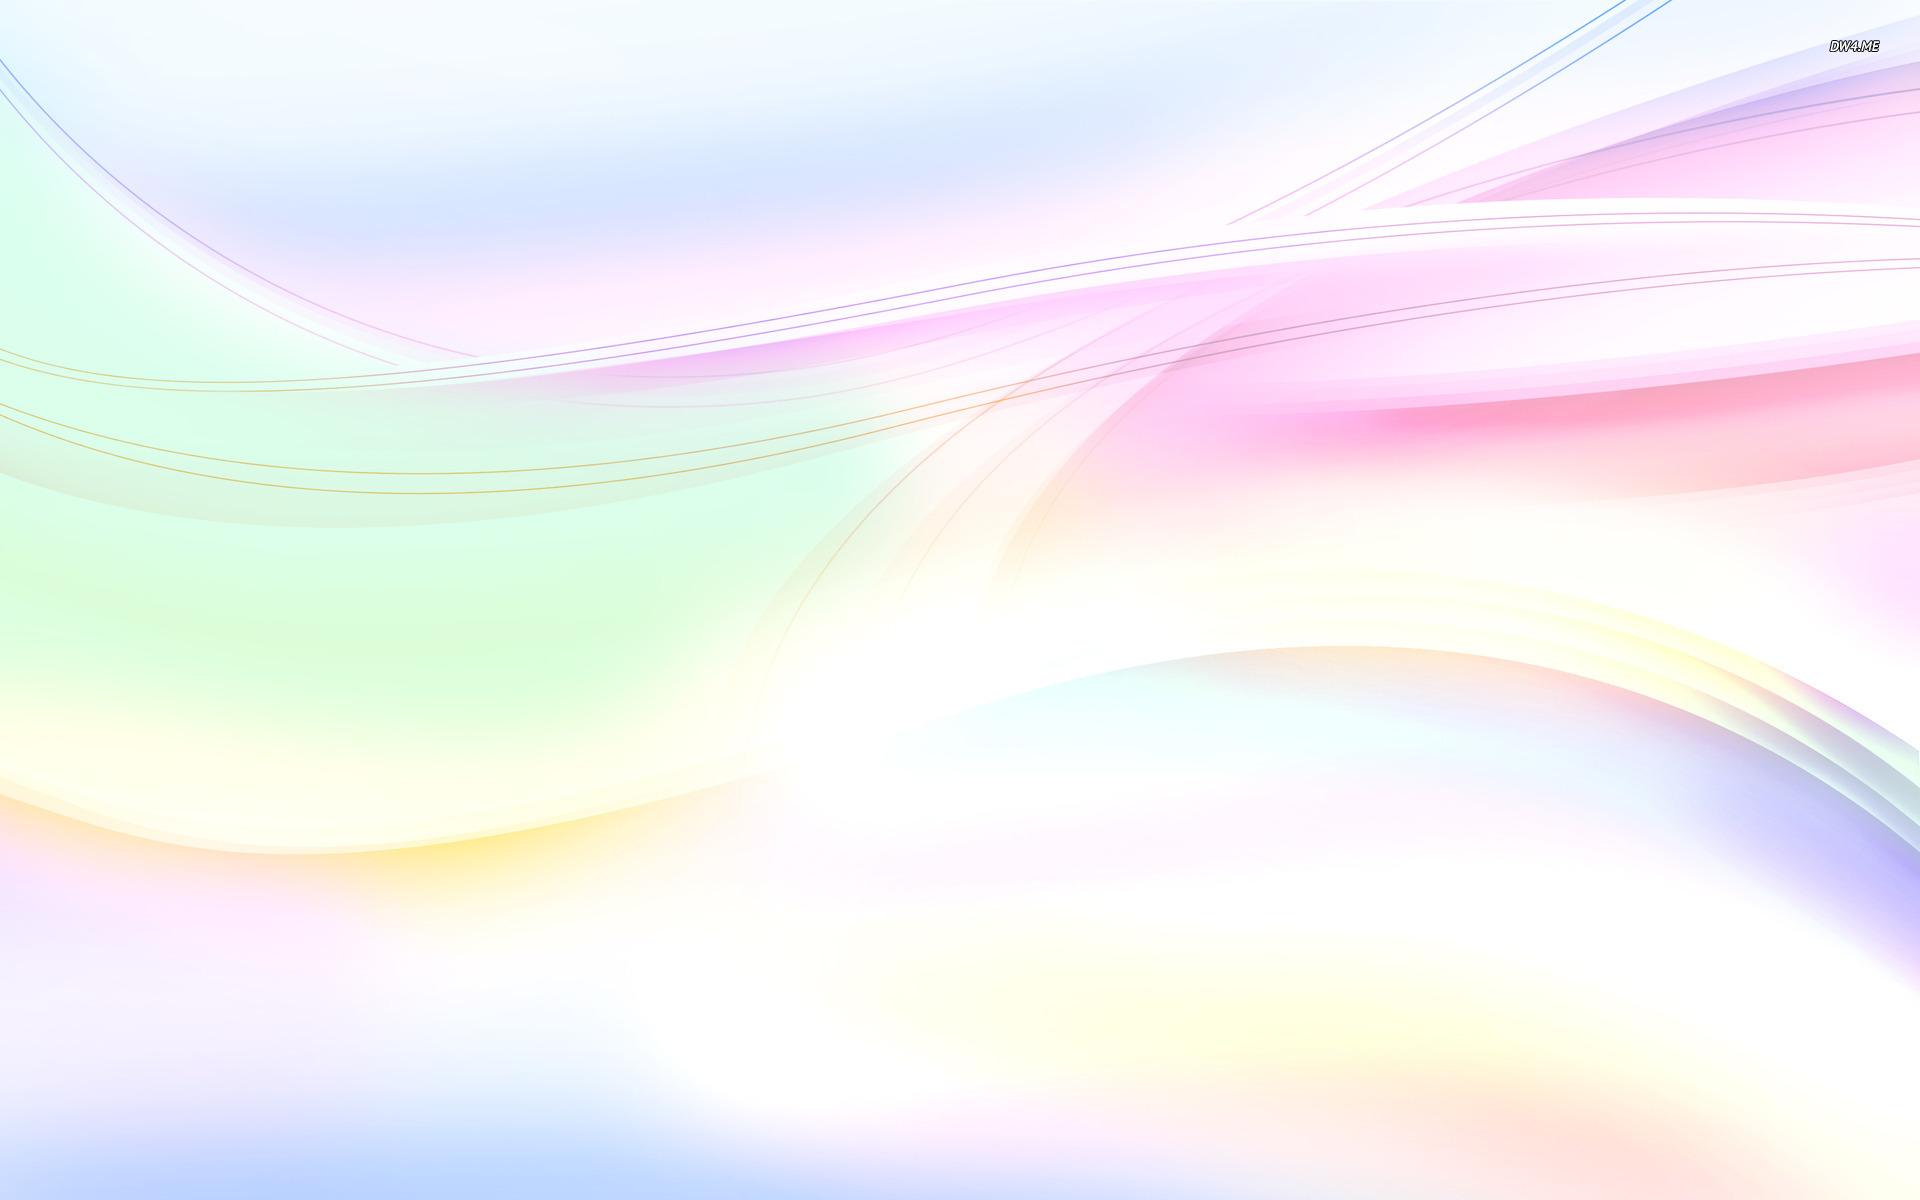 Download 970 Background Tumblr Color HD Paling Keren